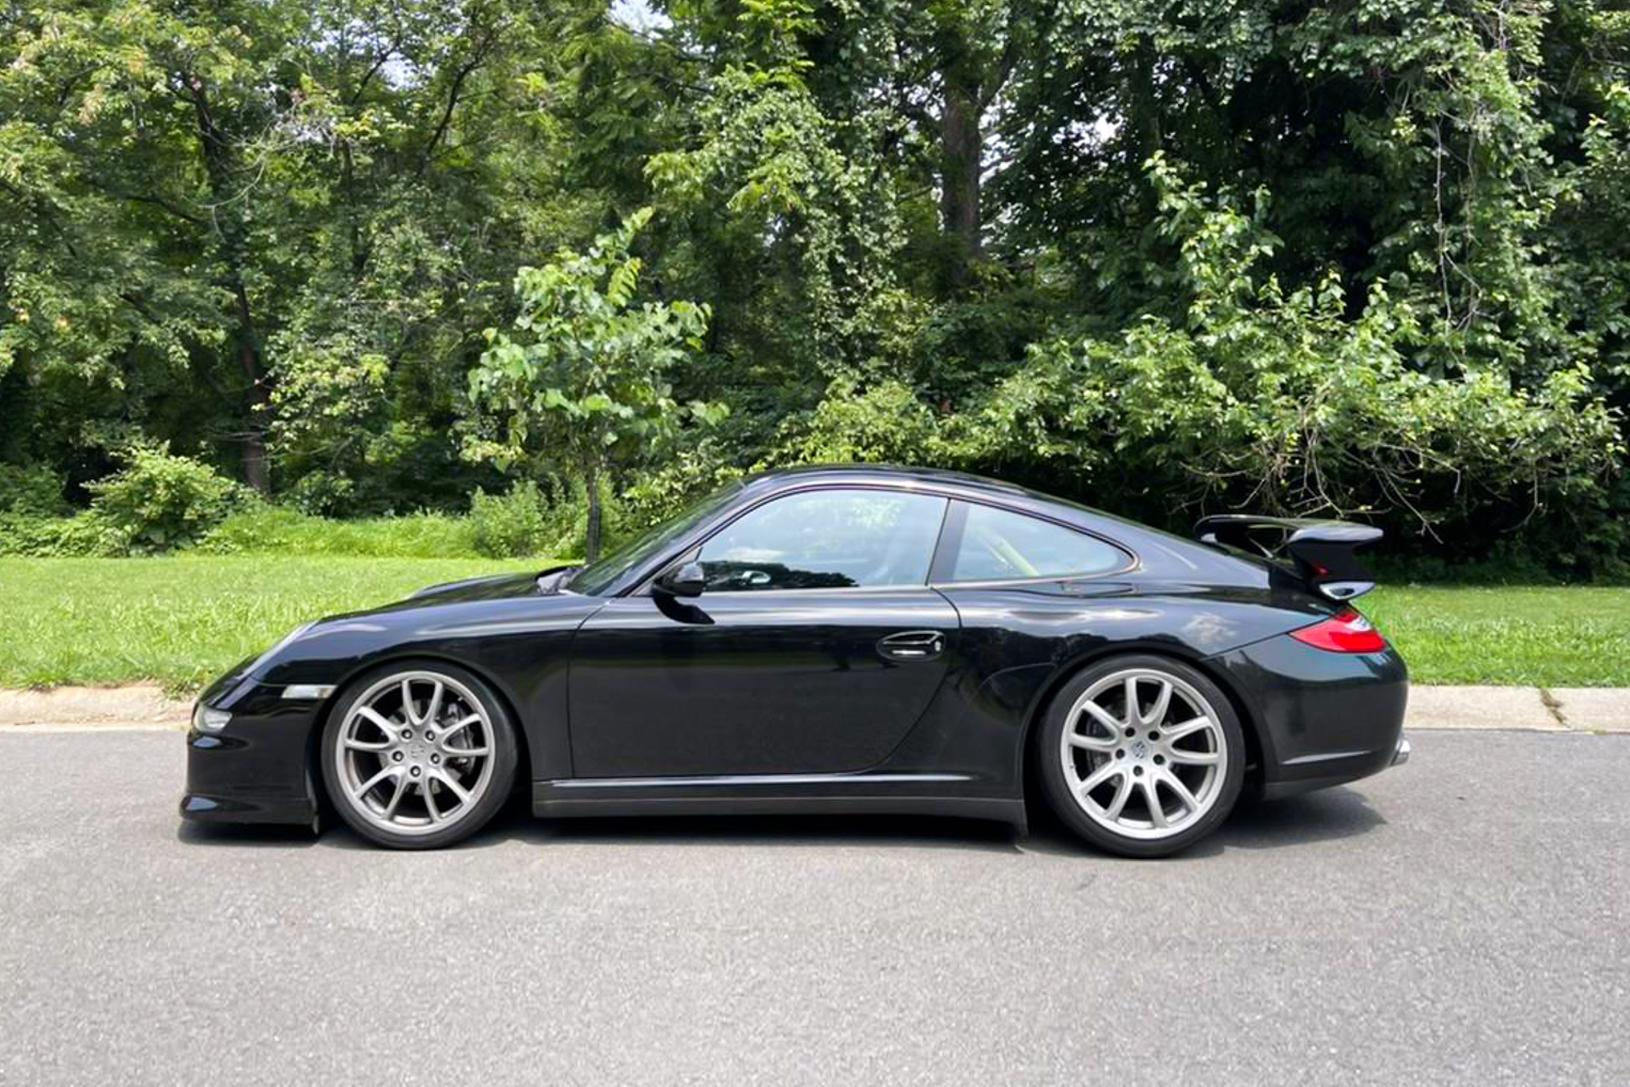 2008 Porsche 911 C4 'Track Car'